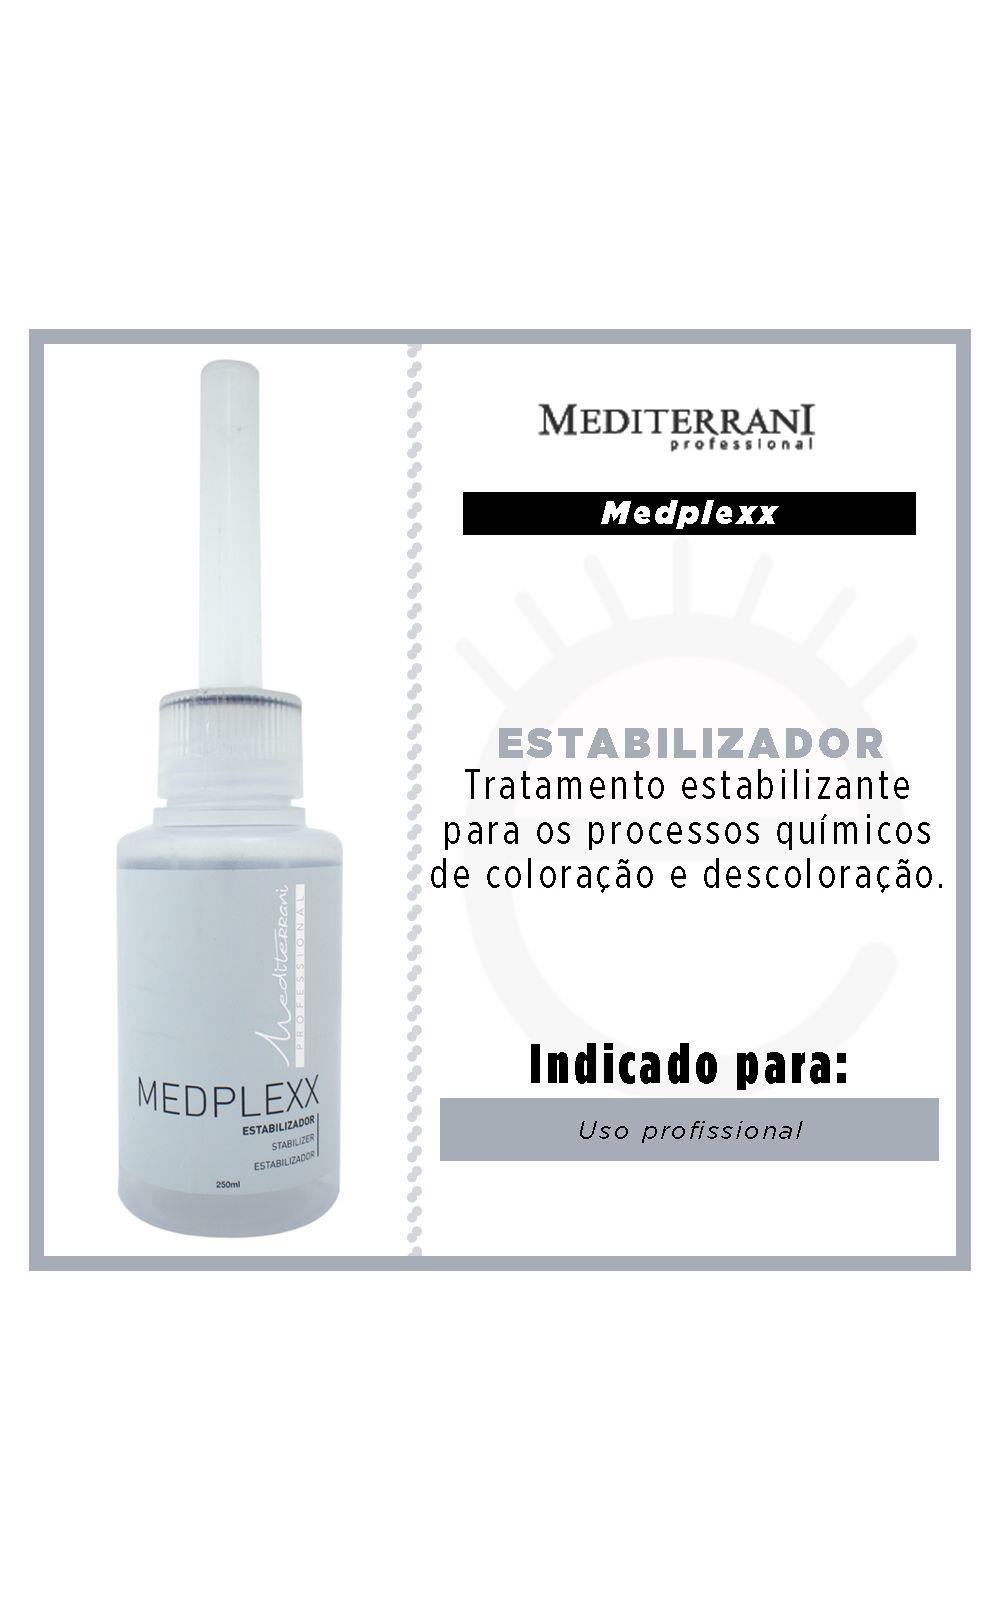 Foto 2 - Óleo Estabilizador Mediterrani - Medplexx - 250ml